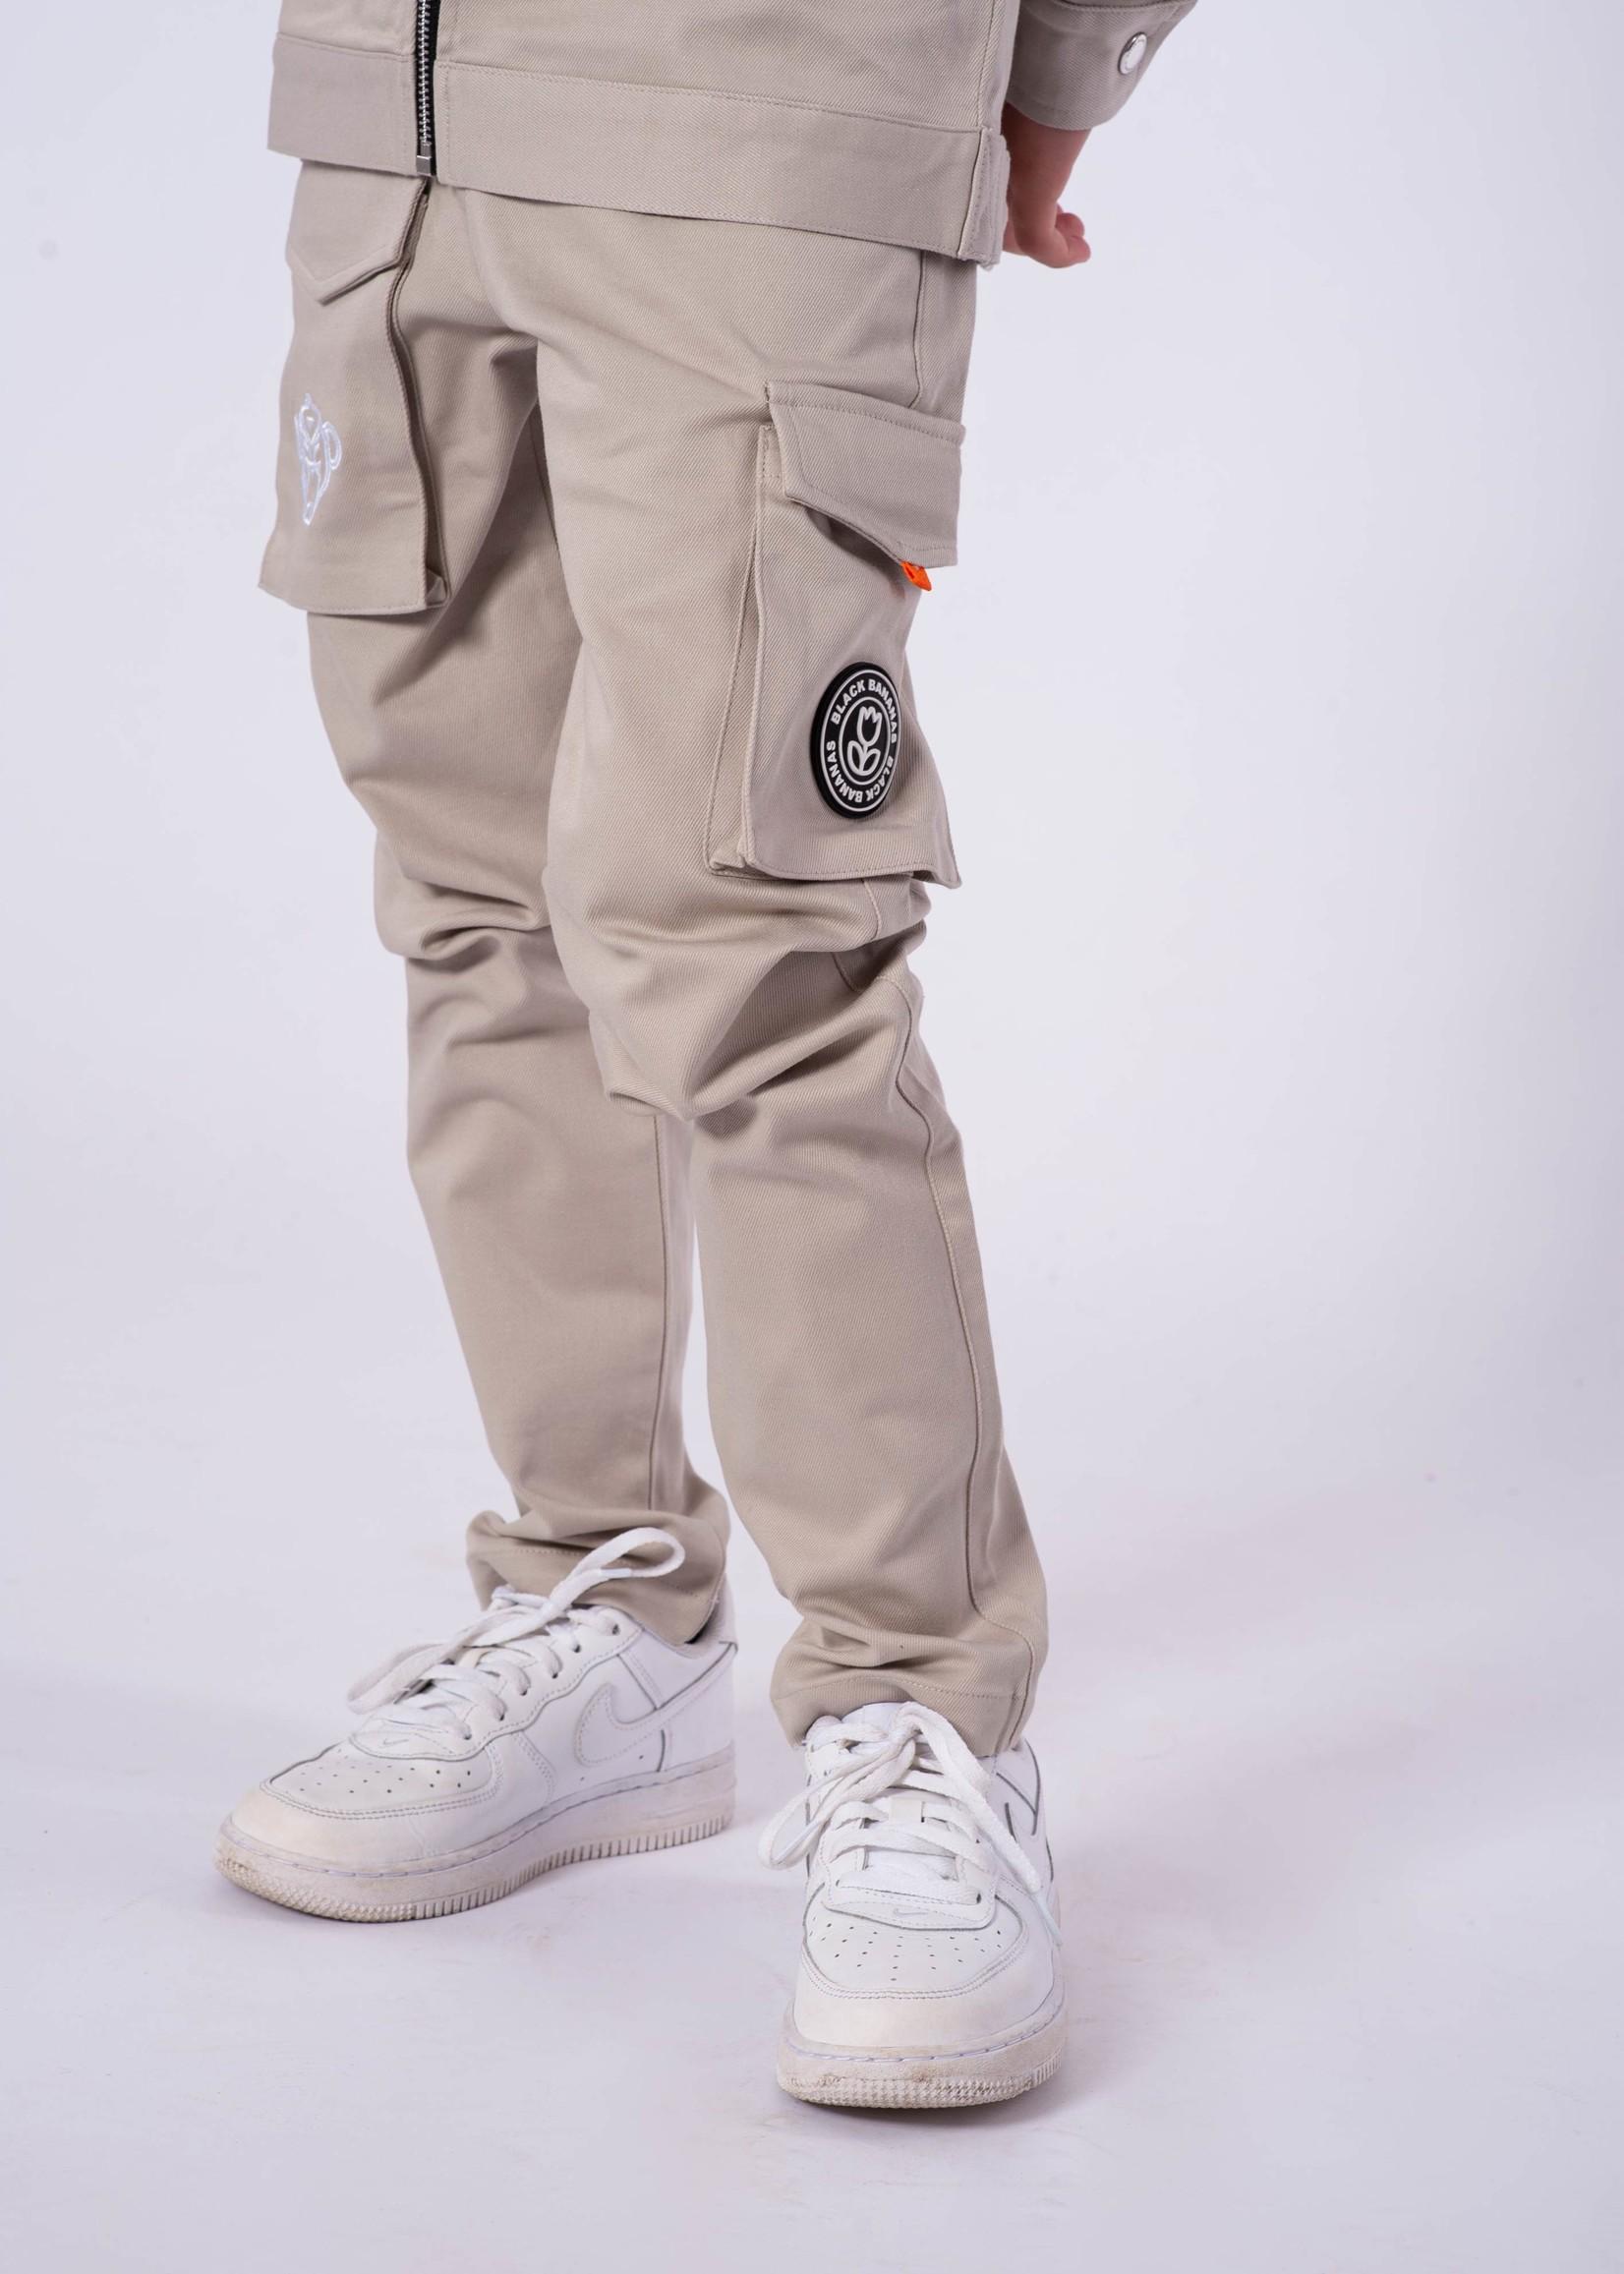 Black Bananas Jr Cargo Pants